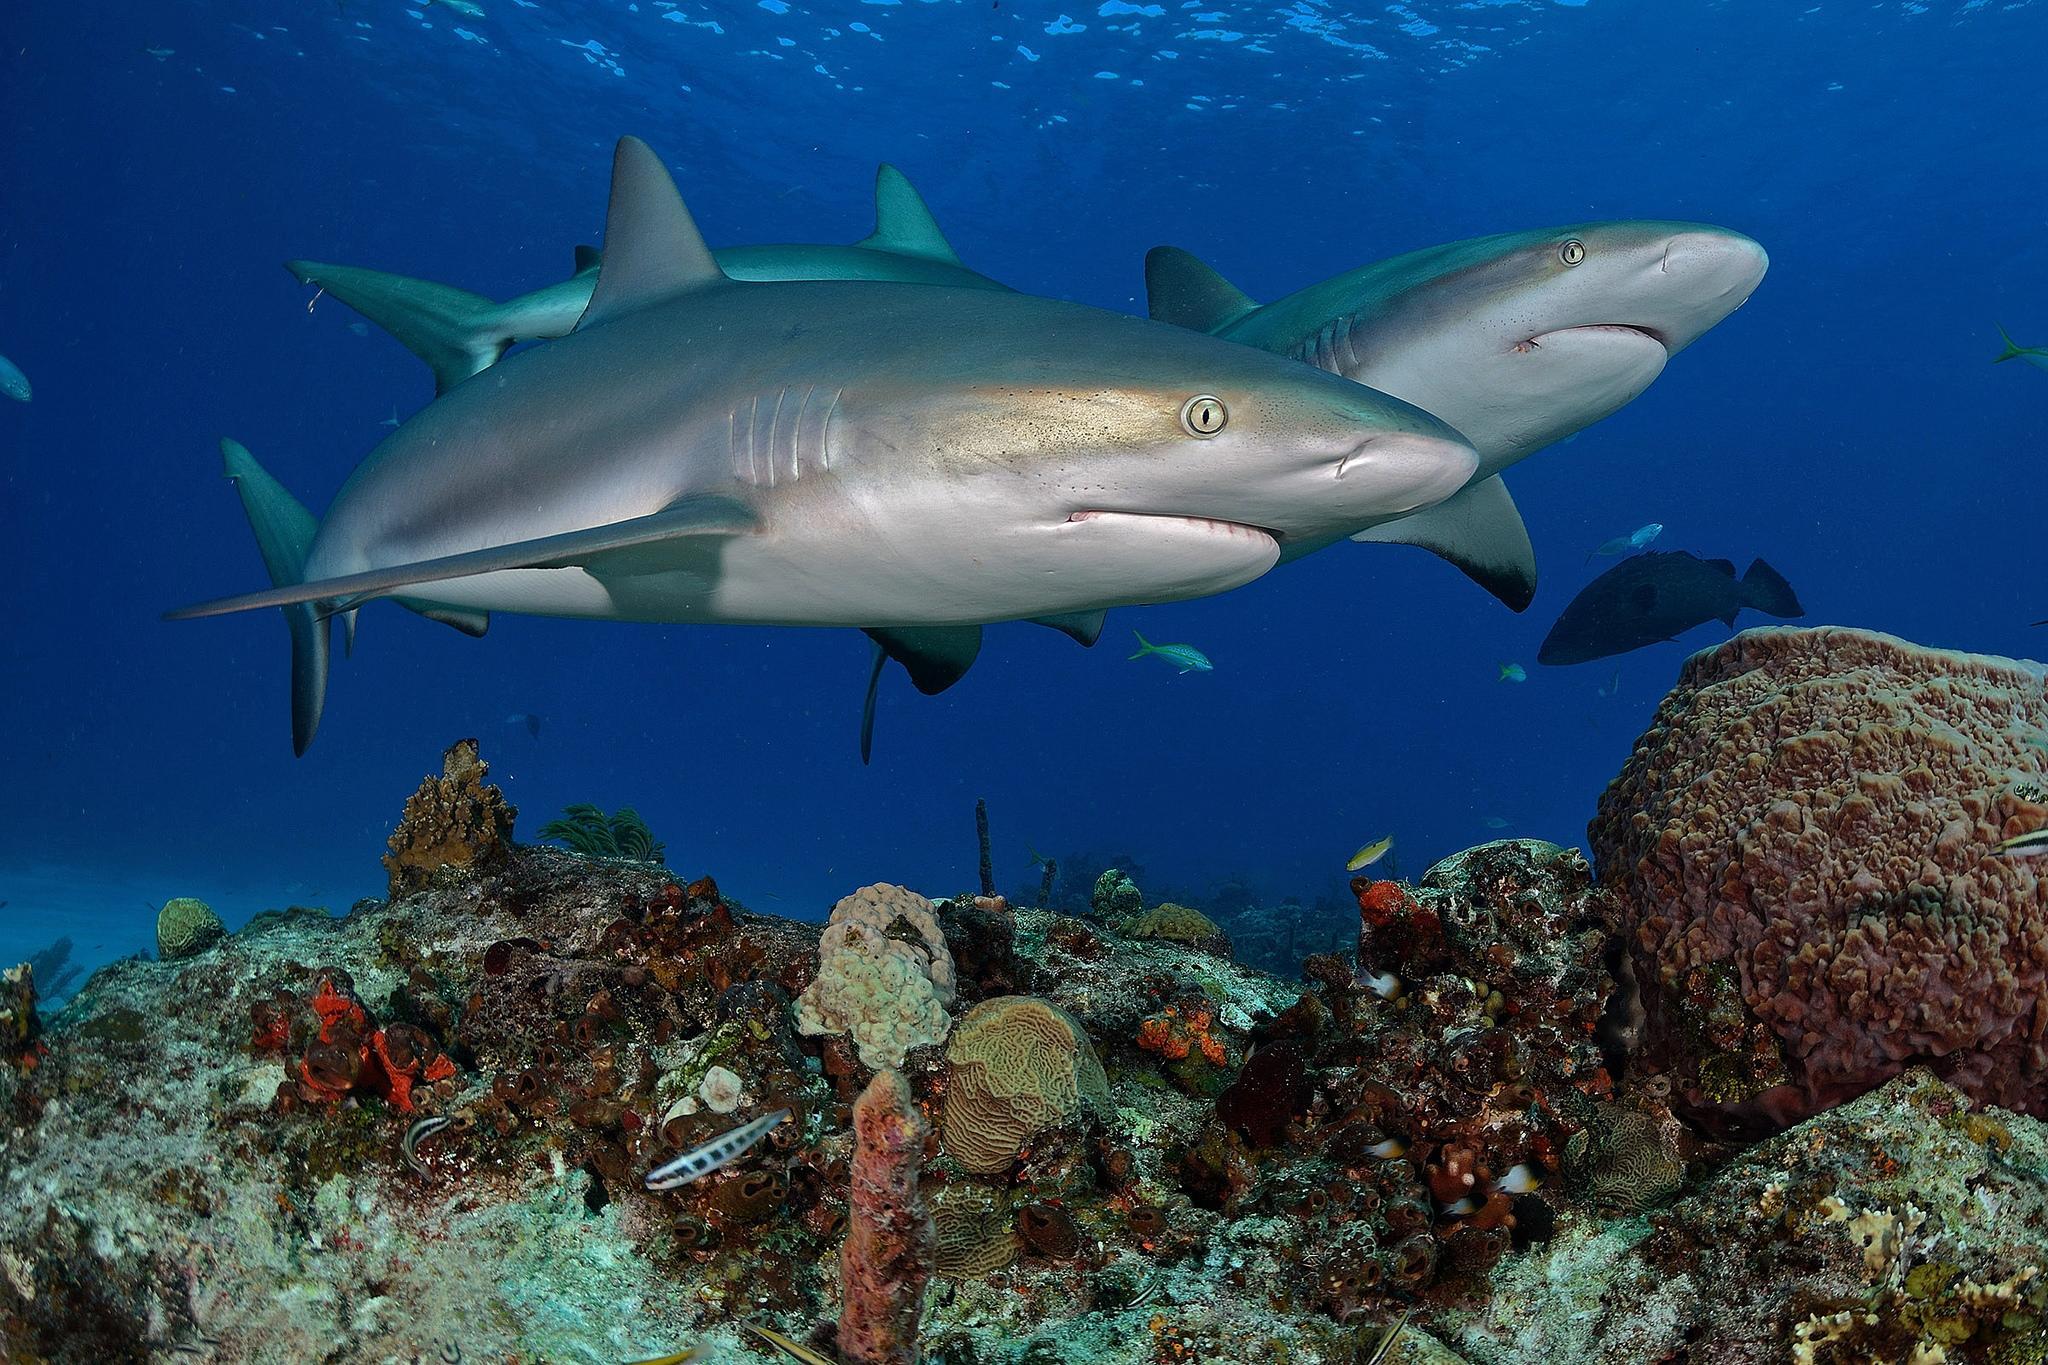 картинки обои для стен море акул даже все